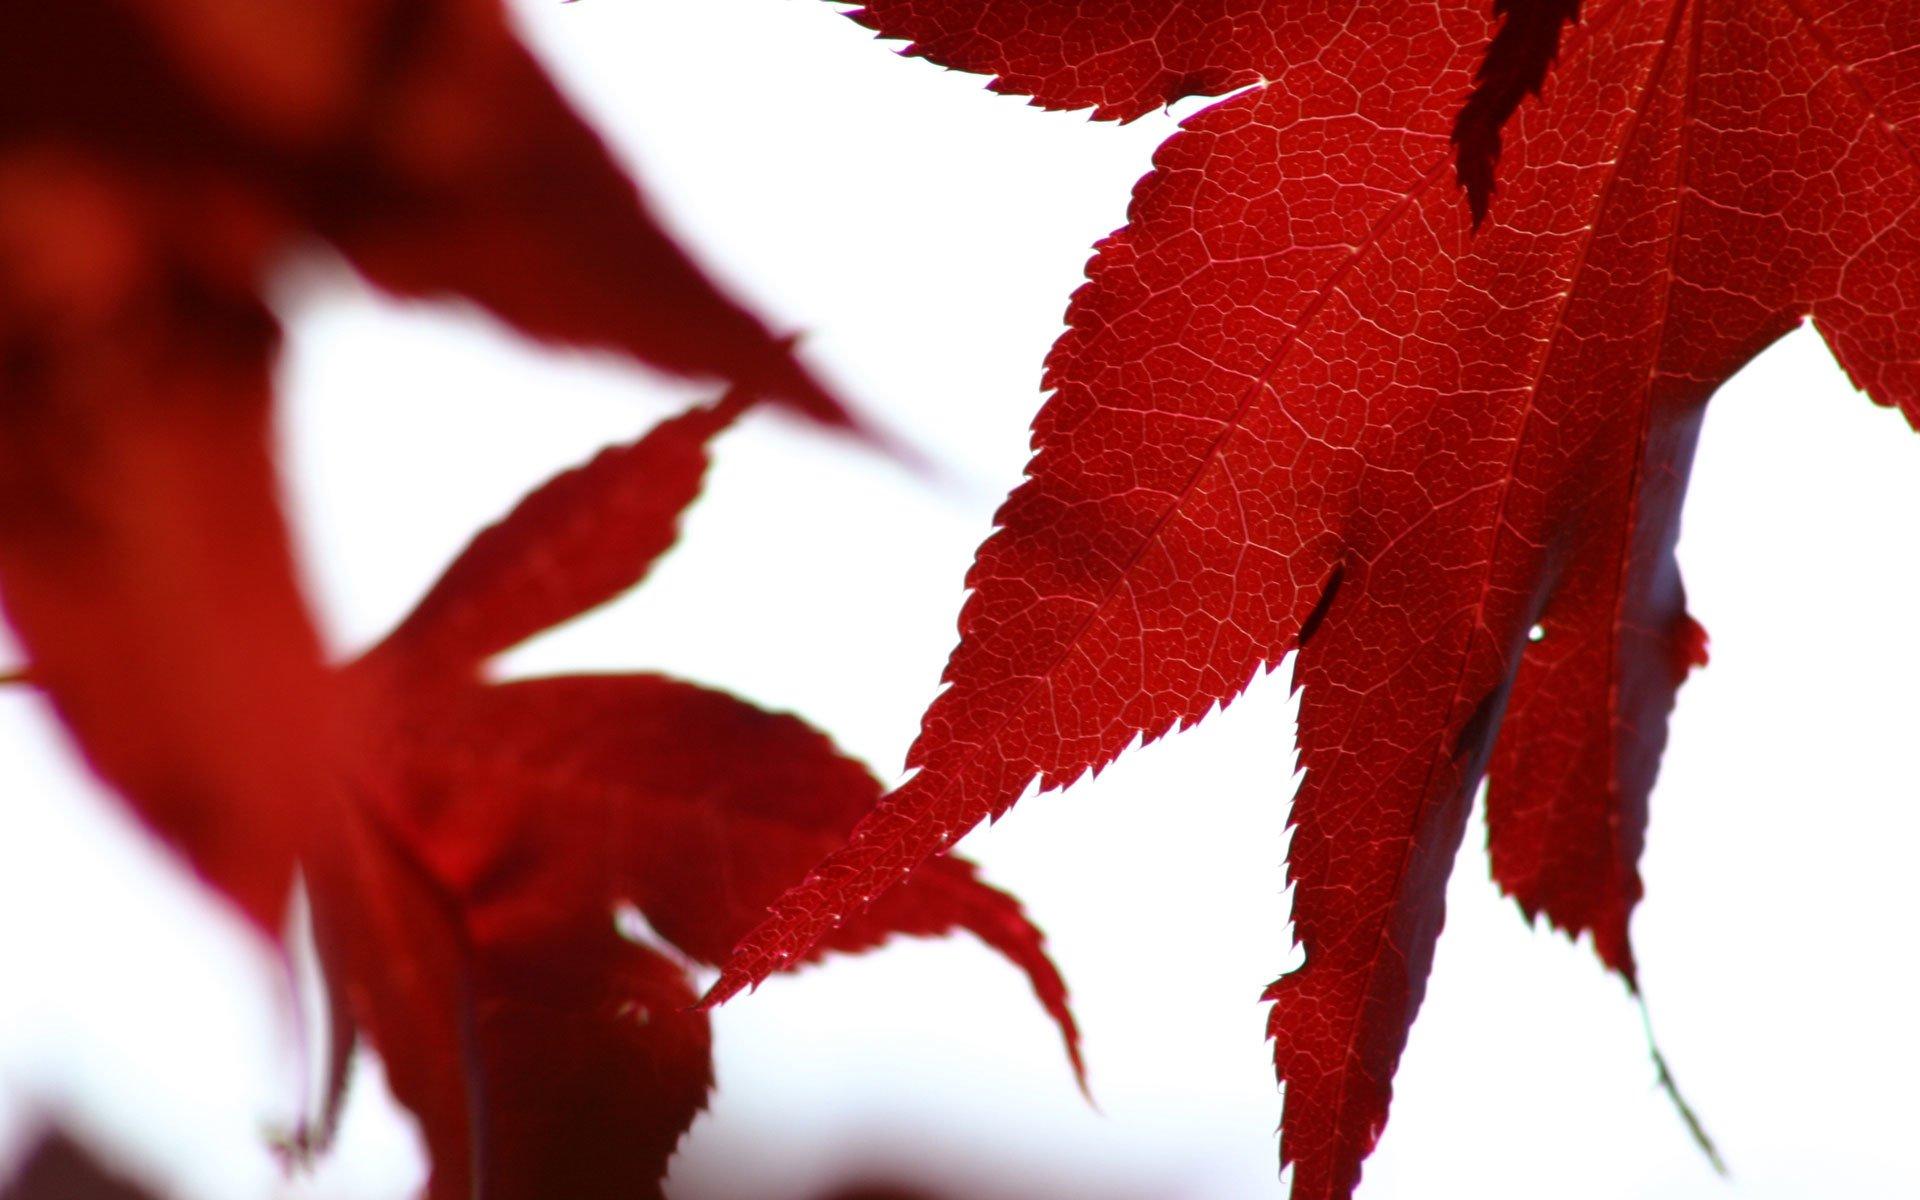 Earth - Leaf  Fall Wallpaper